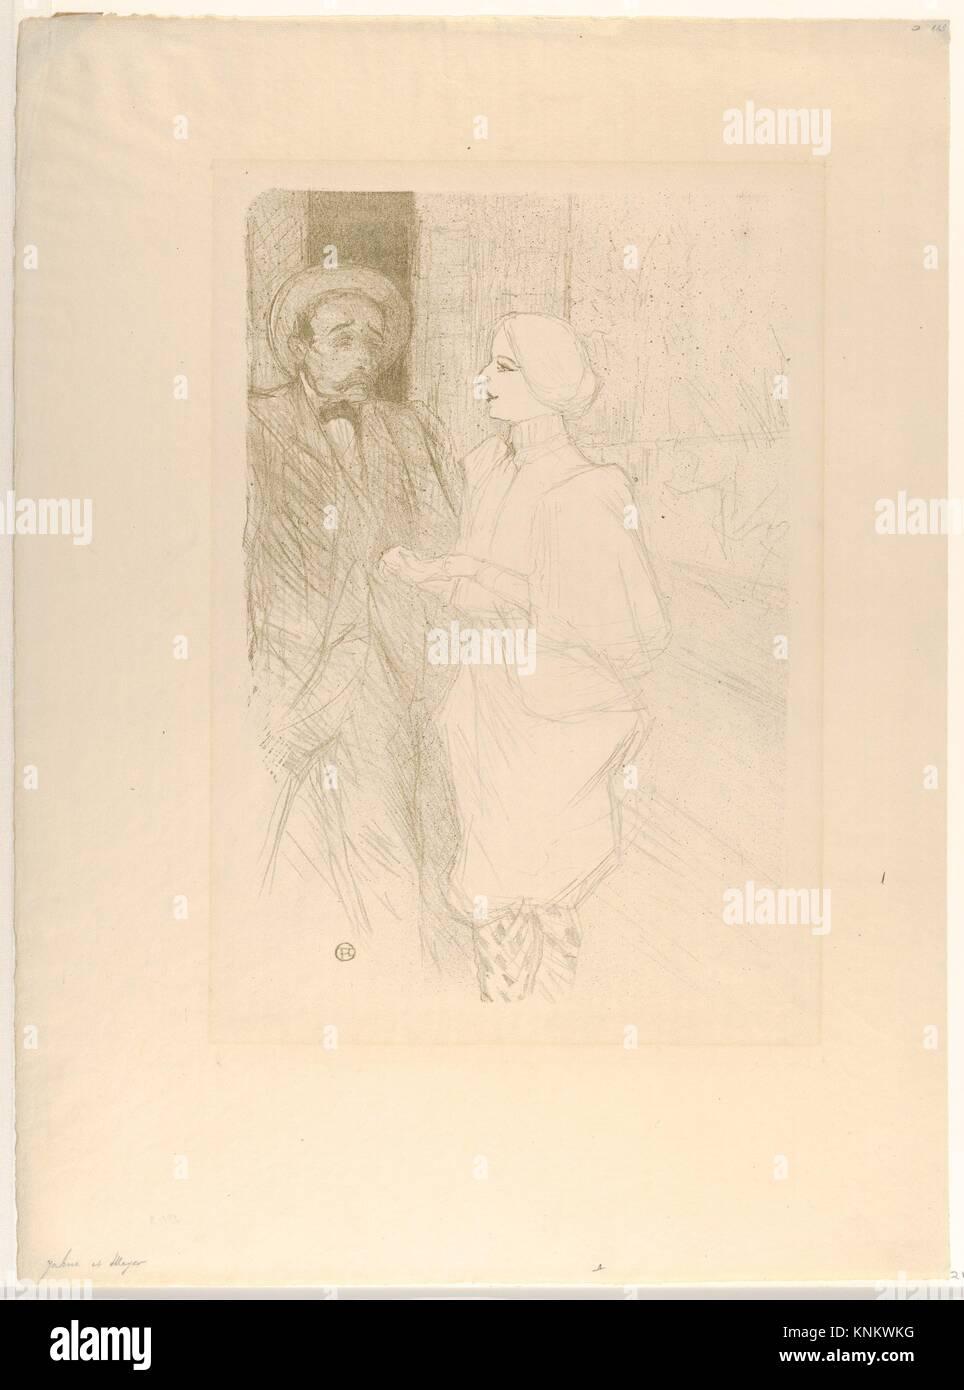 Léonie Yahne and Henry Mayer, in L'Age Difficile. Artist: Henri de Toulouse-Lautrec (French, Albi 1864 - Stock Image